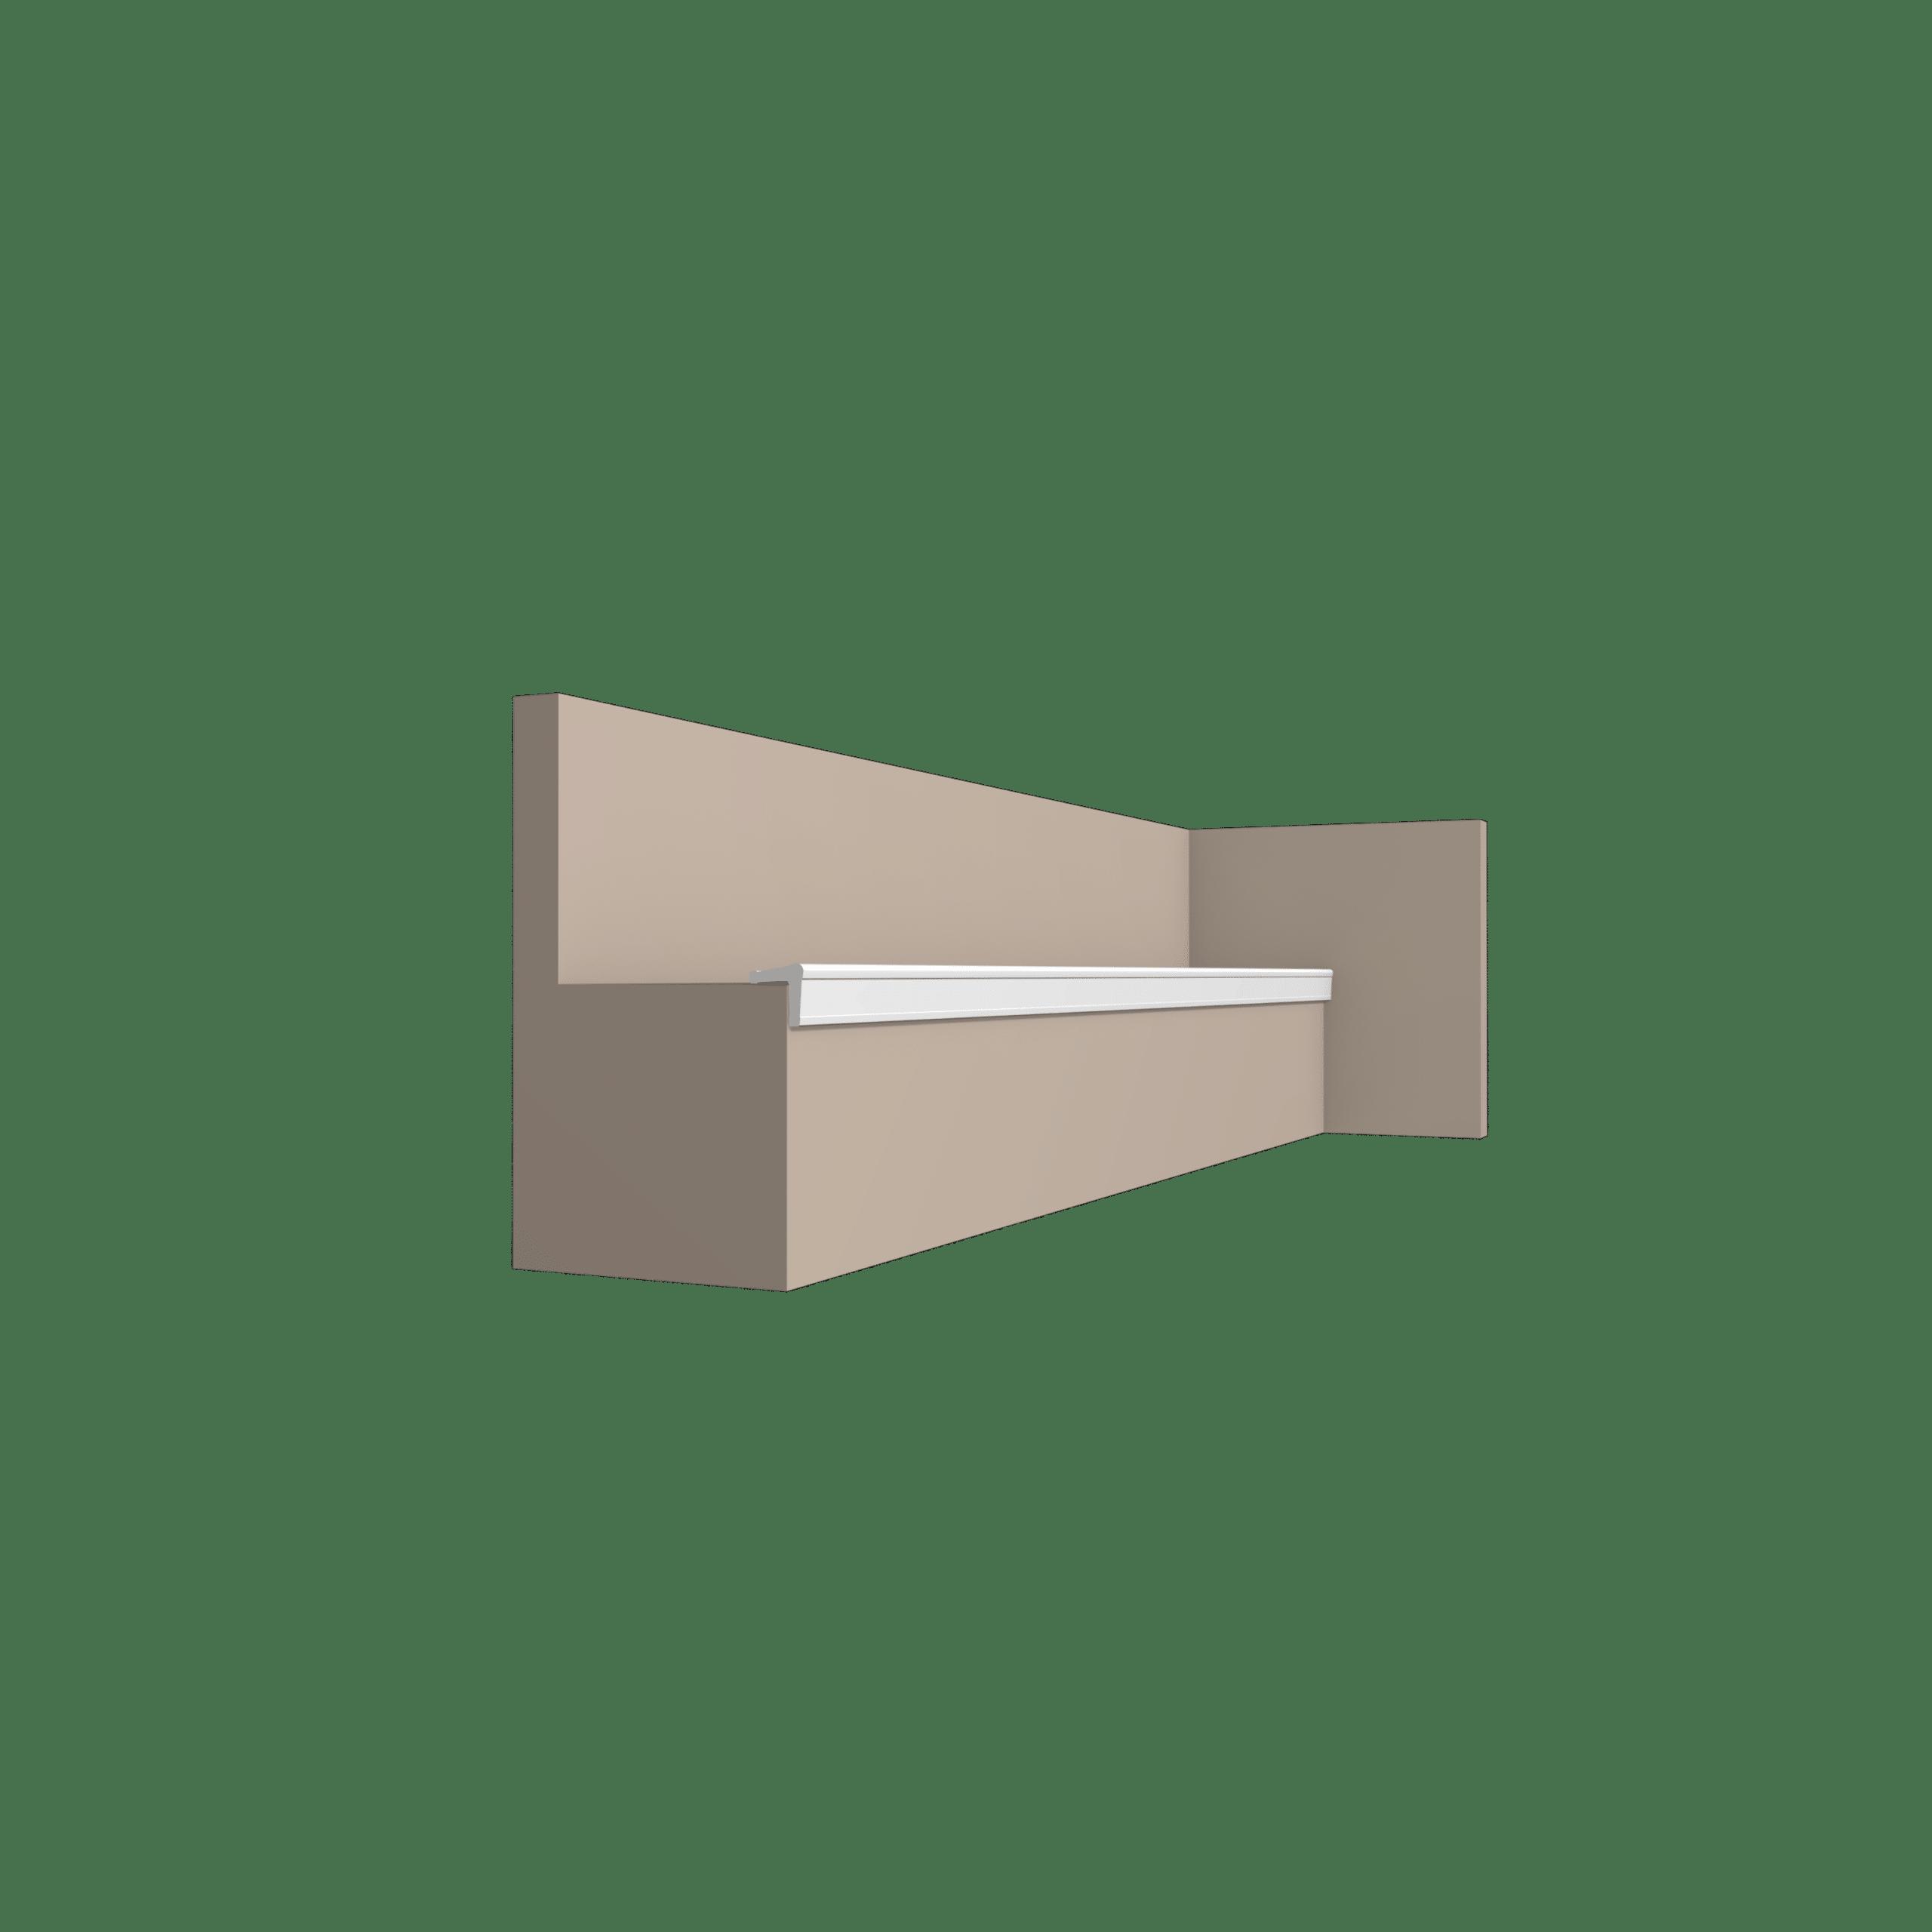 קרניז פוליאוריתן דגם DS - 2424